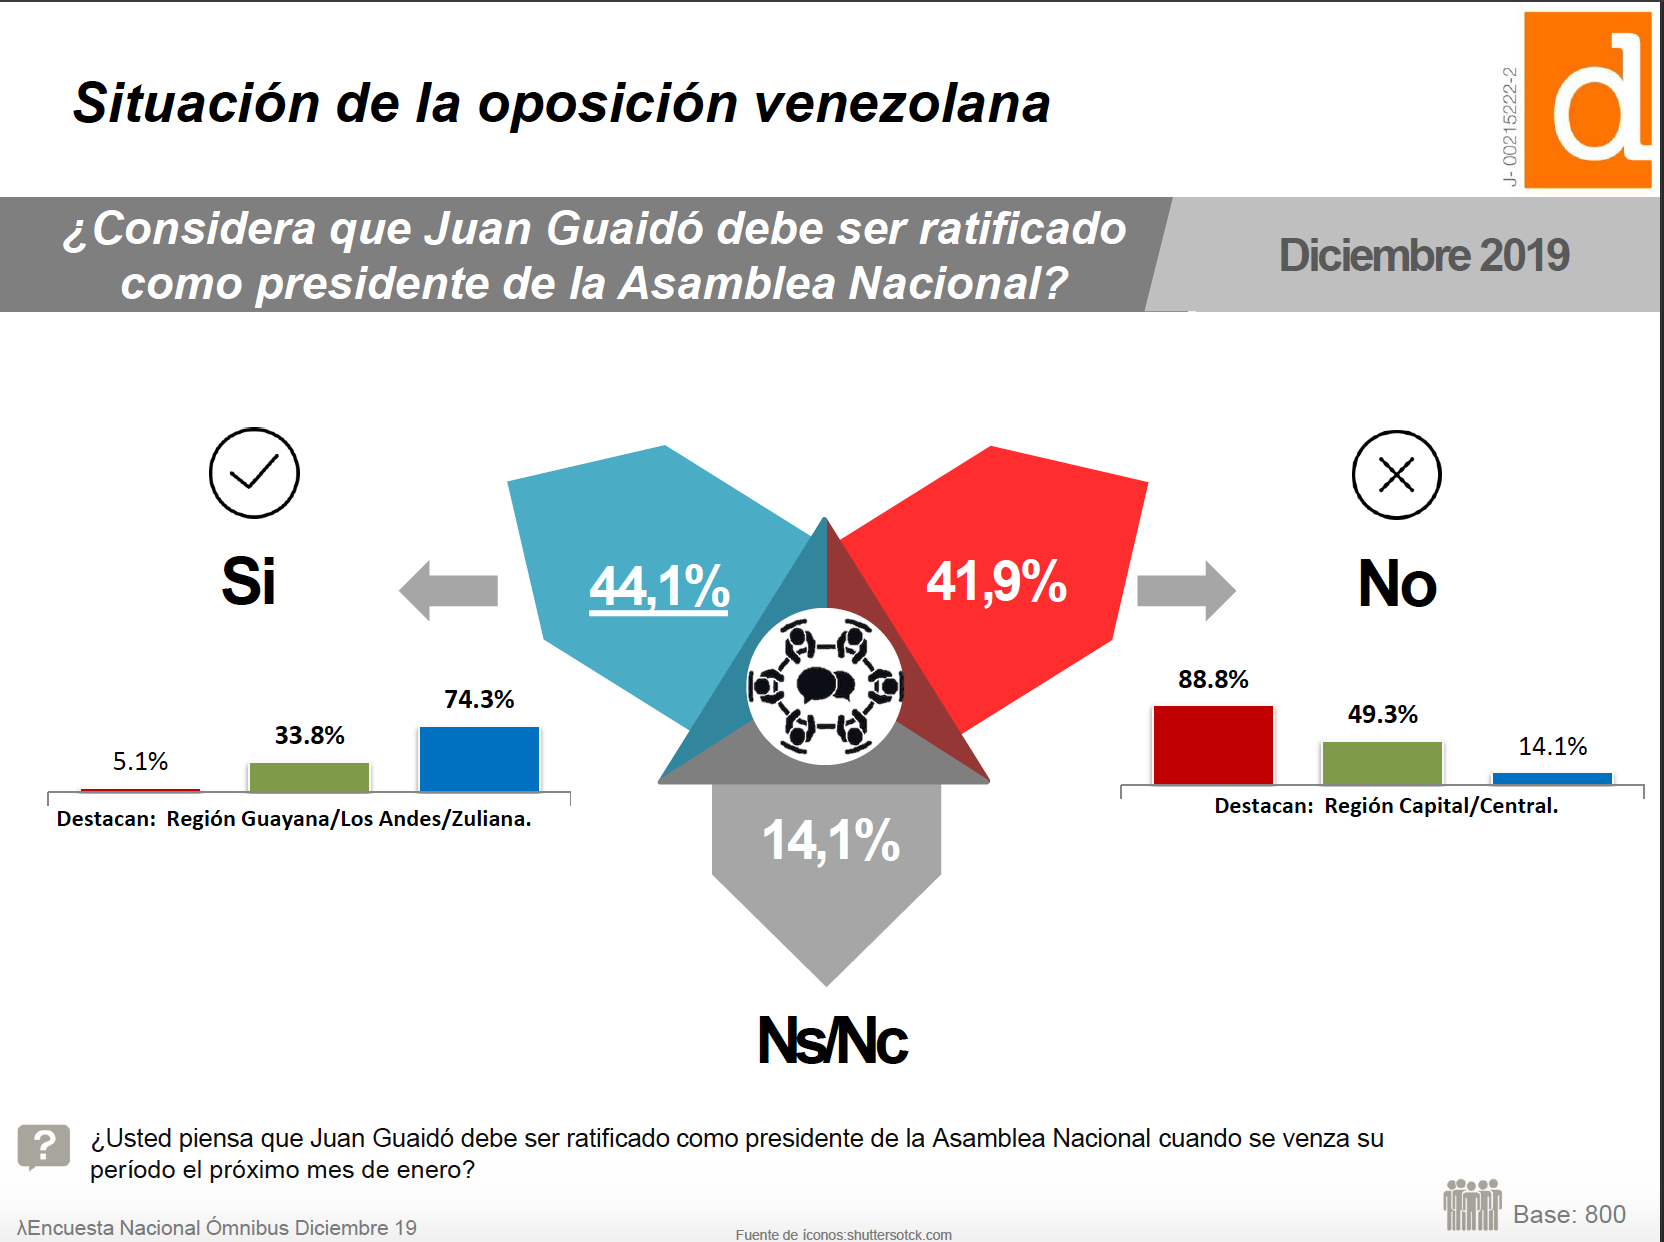 Datanálisis: ¿Debe ratificarse a Juan Guaidó?